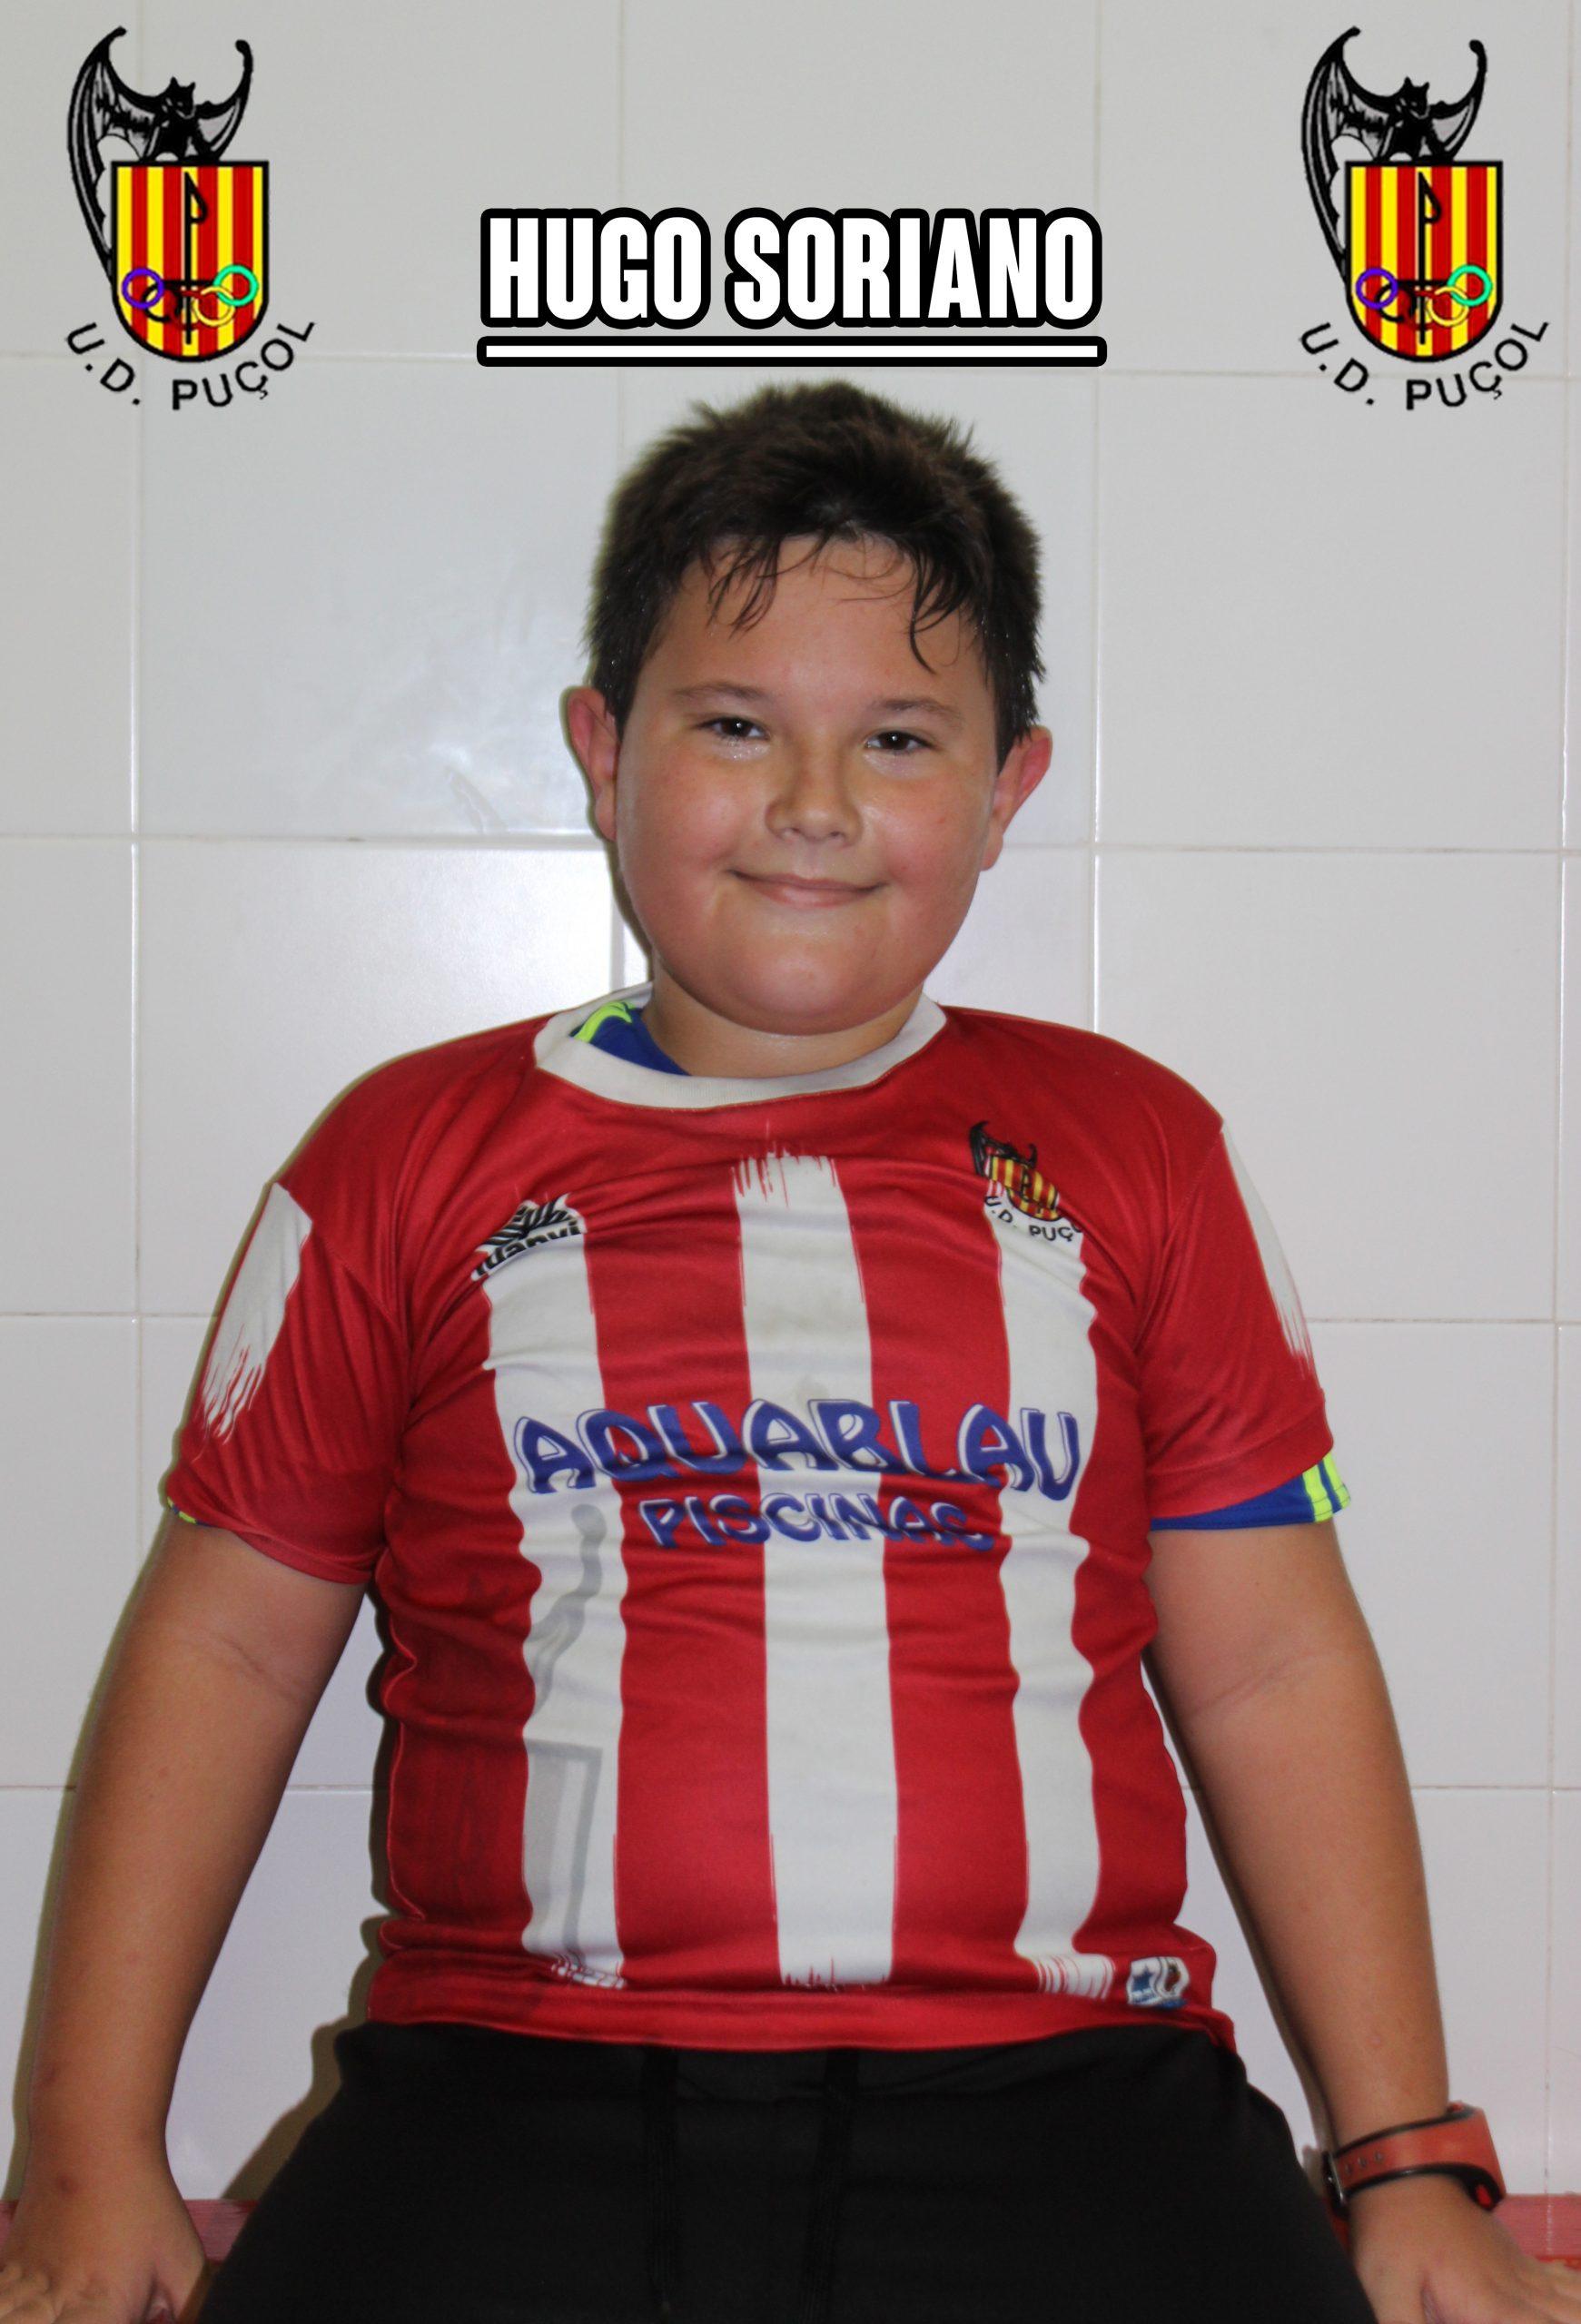 Hugo Soriano